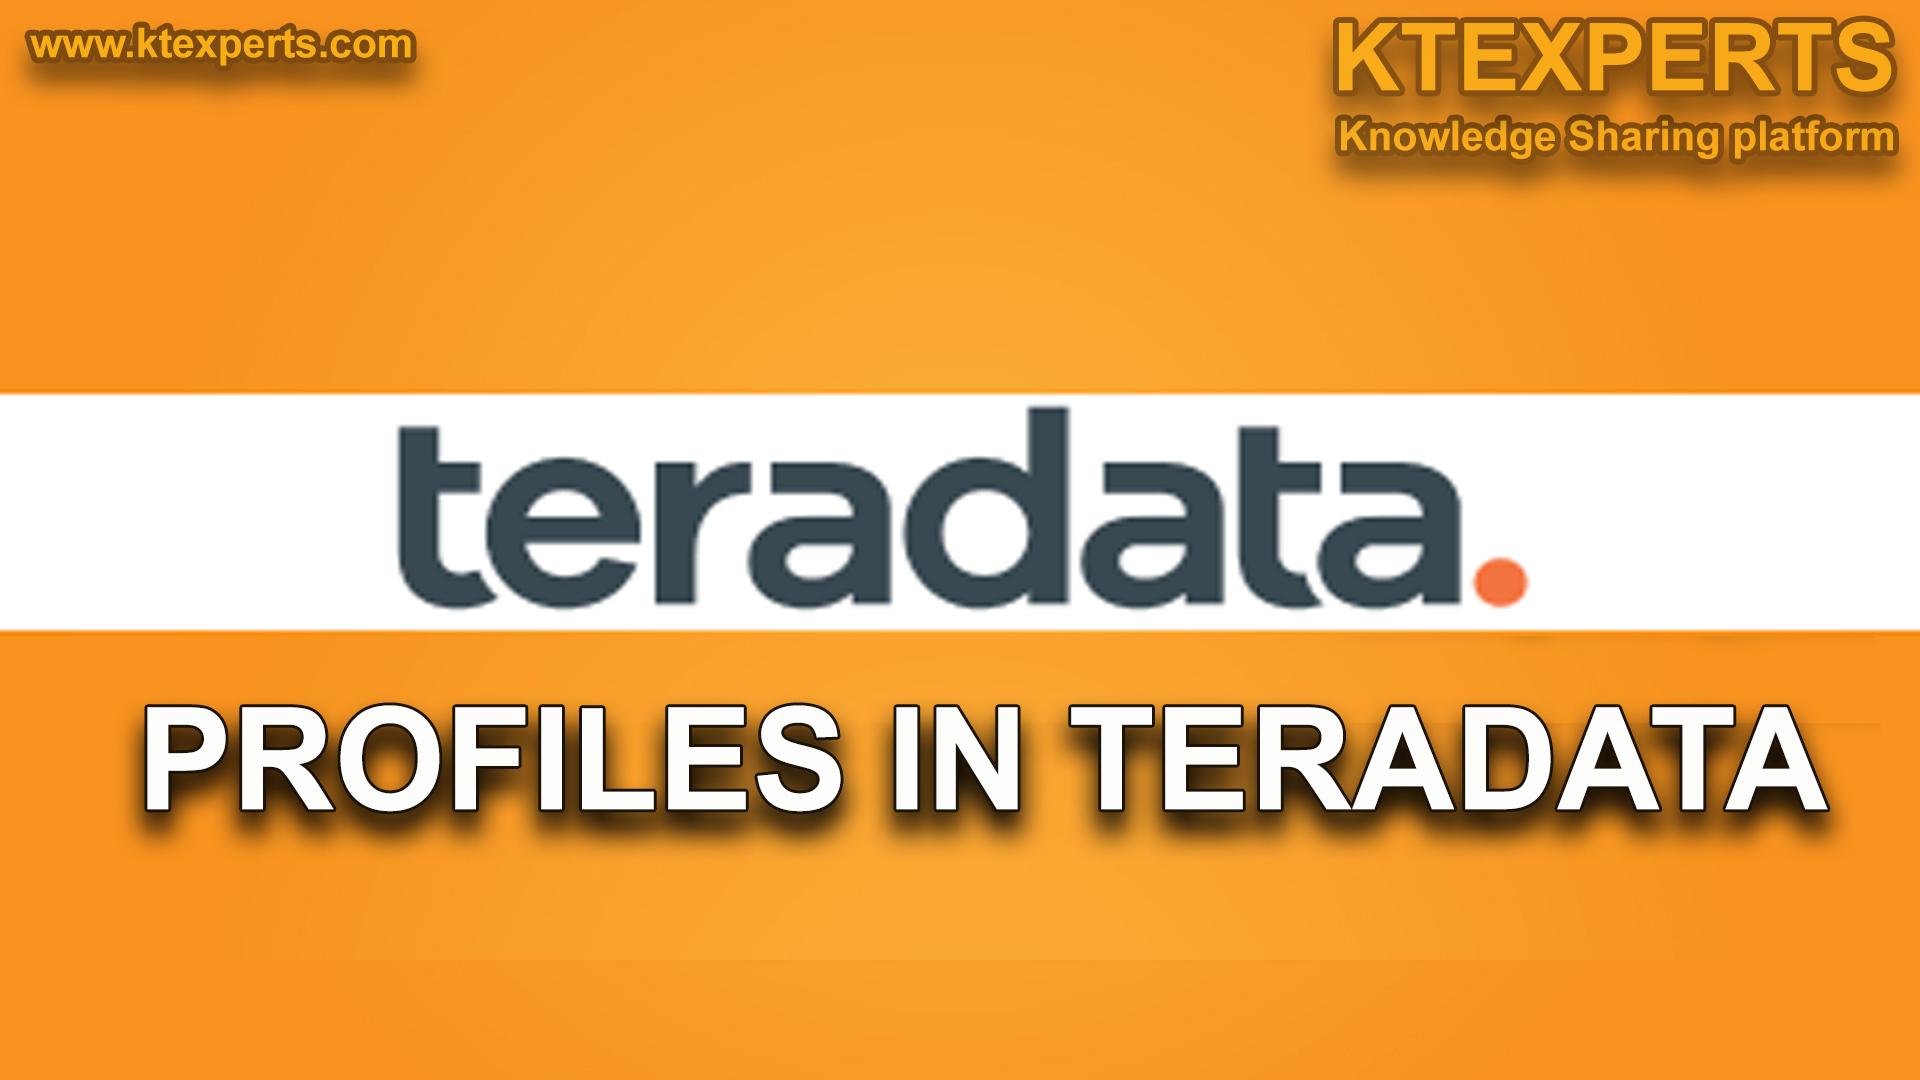 PROFILES IN TERADATA